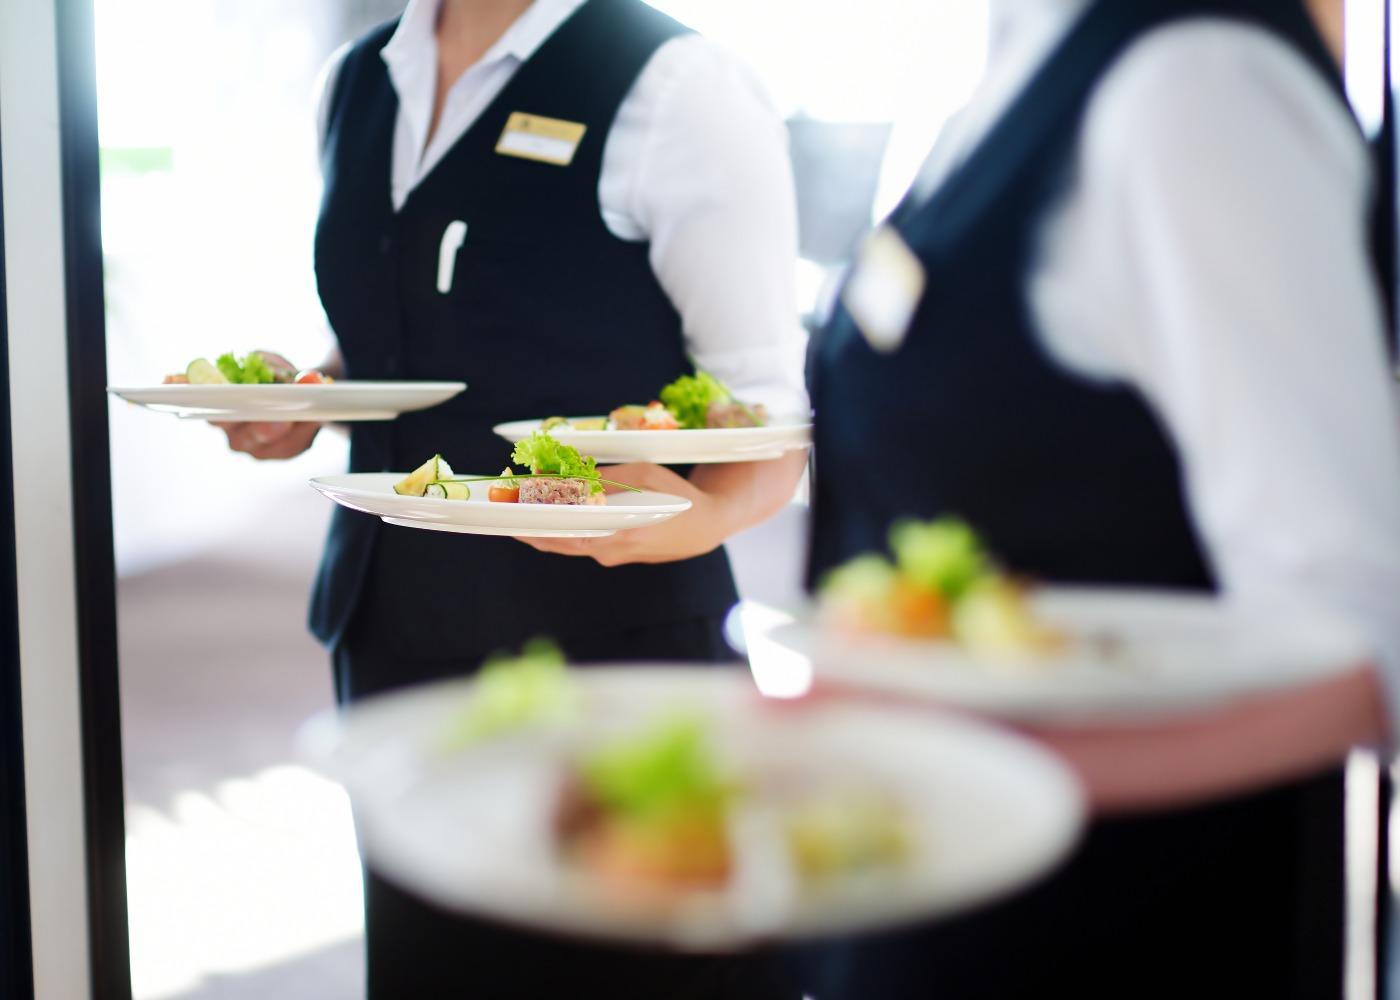 staff de catering a servir um jantar